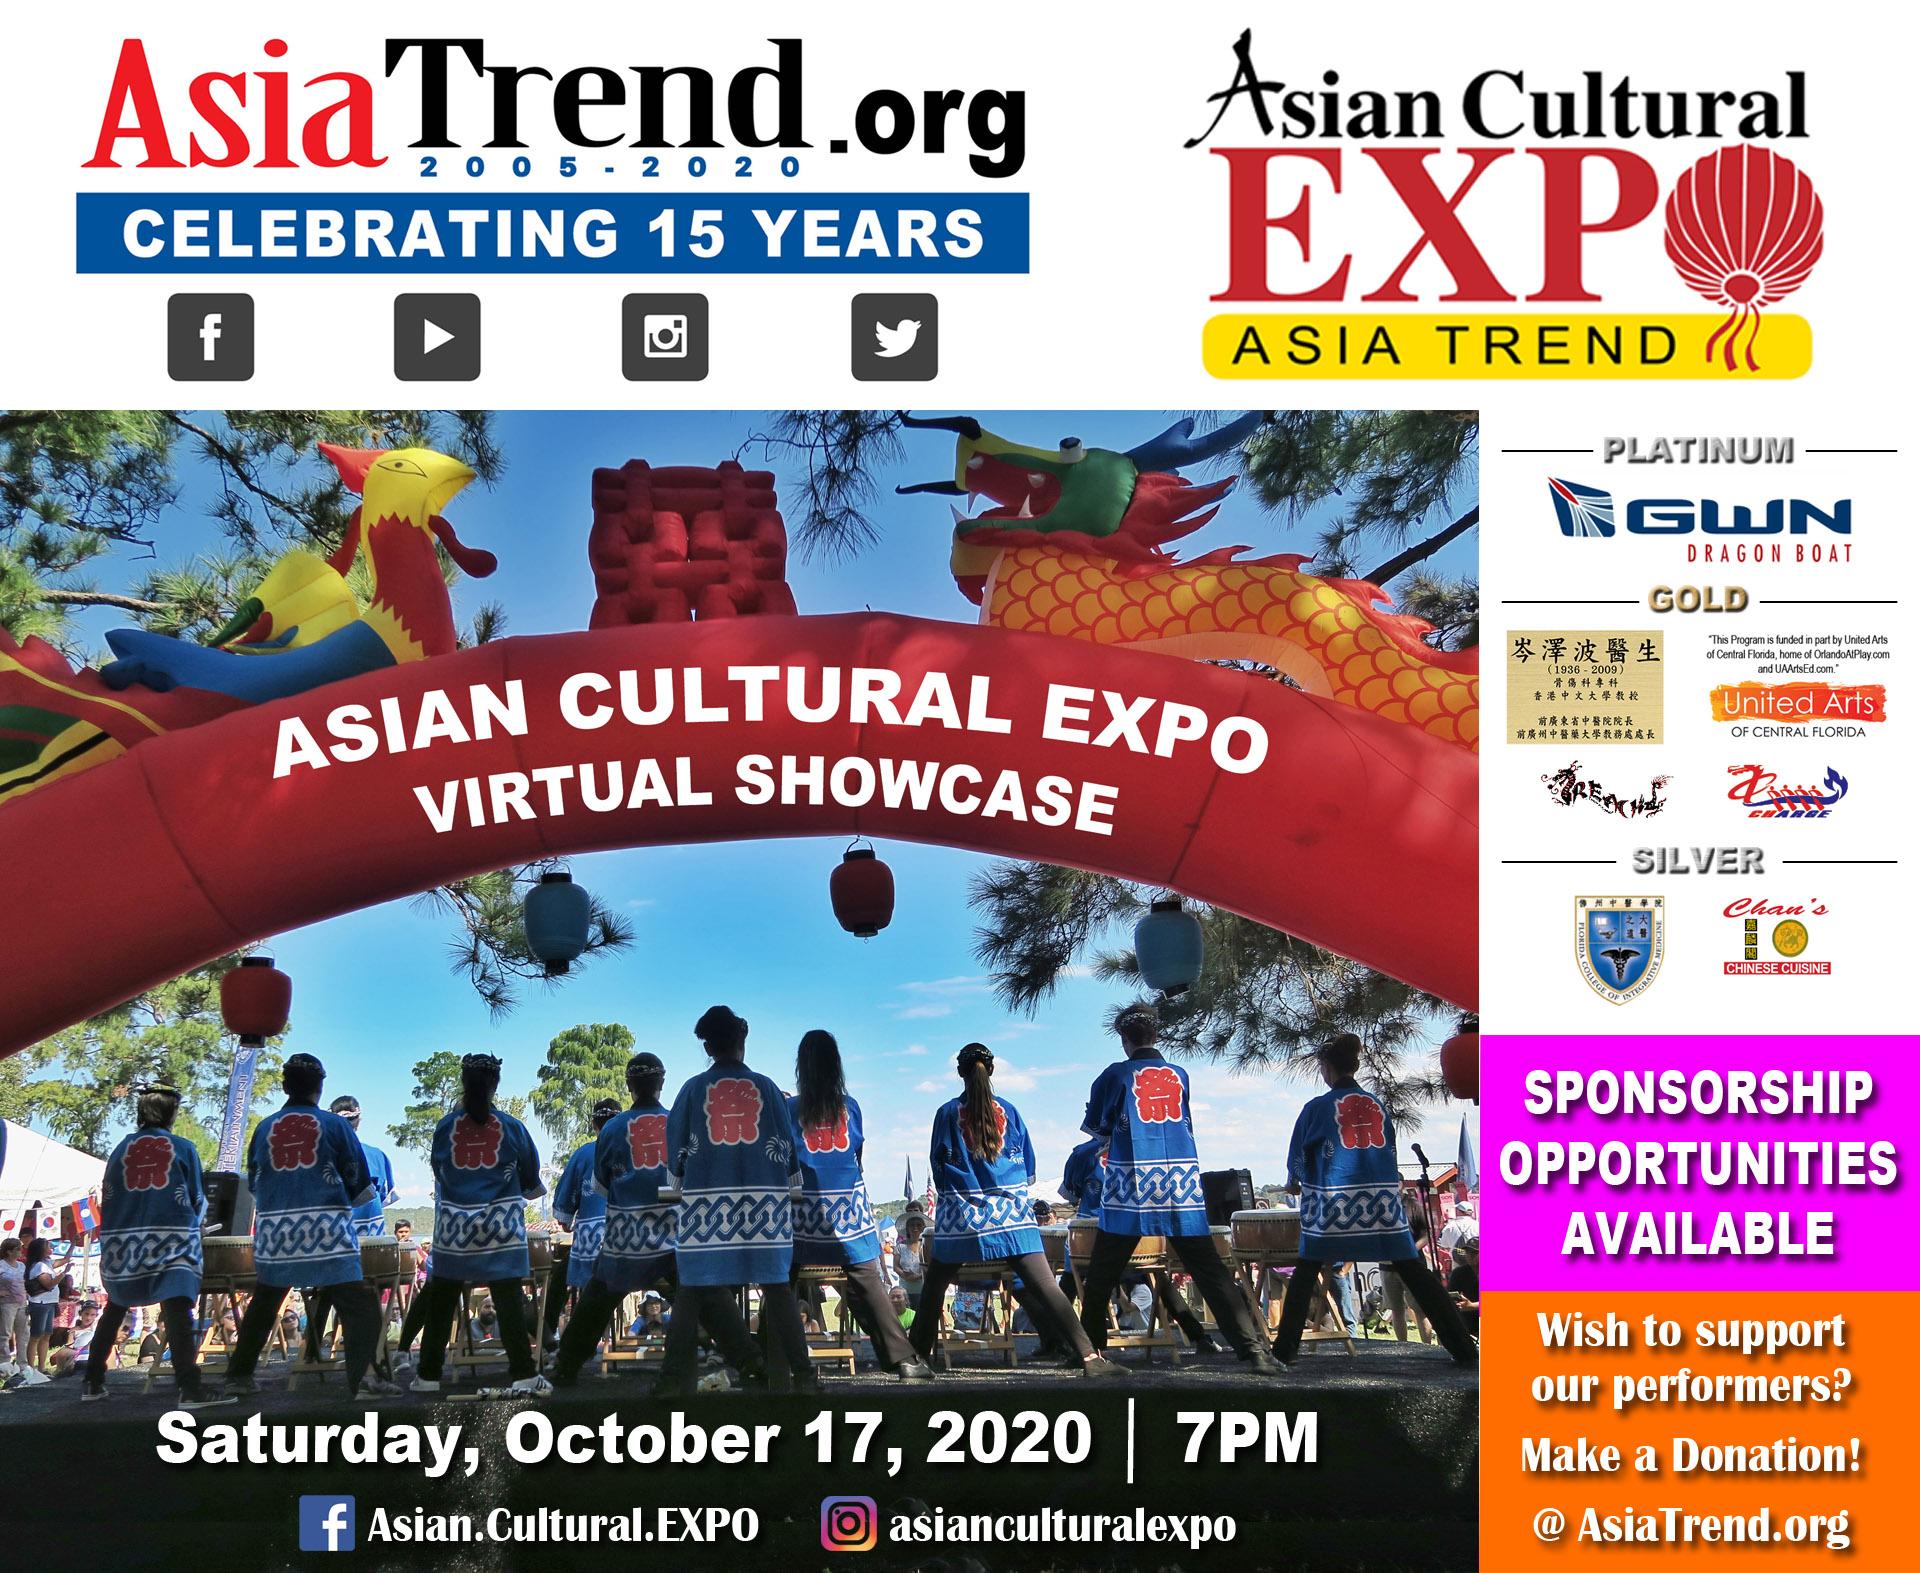 Asia Trend Asian Cultural Expo 2020 Virtual Showcase